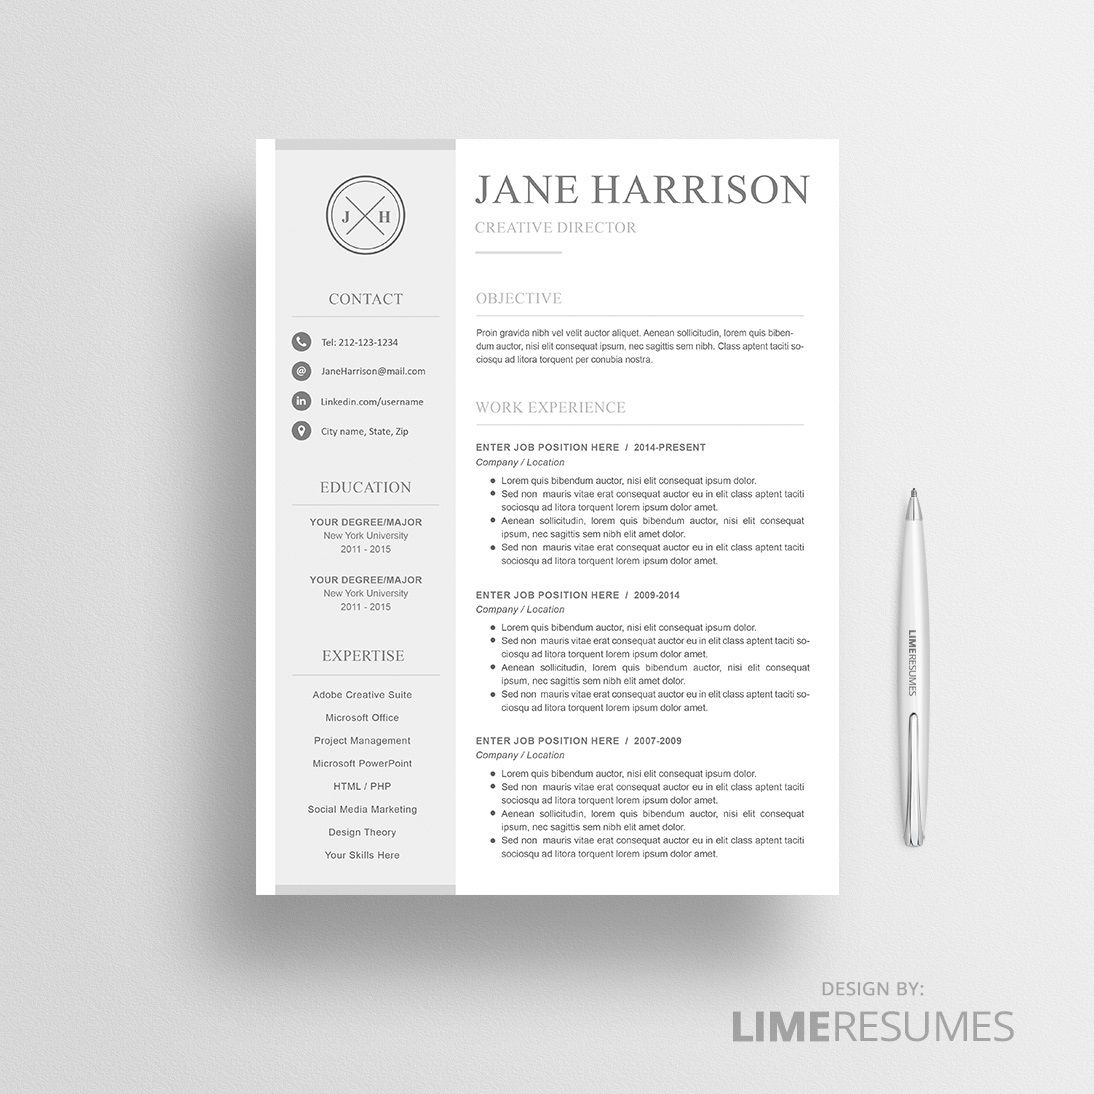 008 Astounding Resume Template On Word Design  Free Download Australia Microsoft Office 2007 PhilippineFull